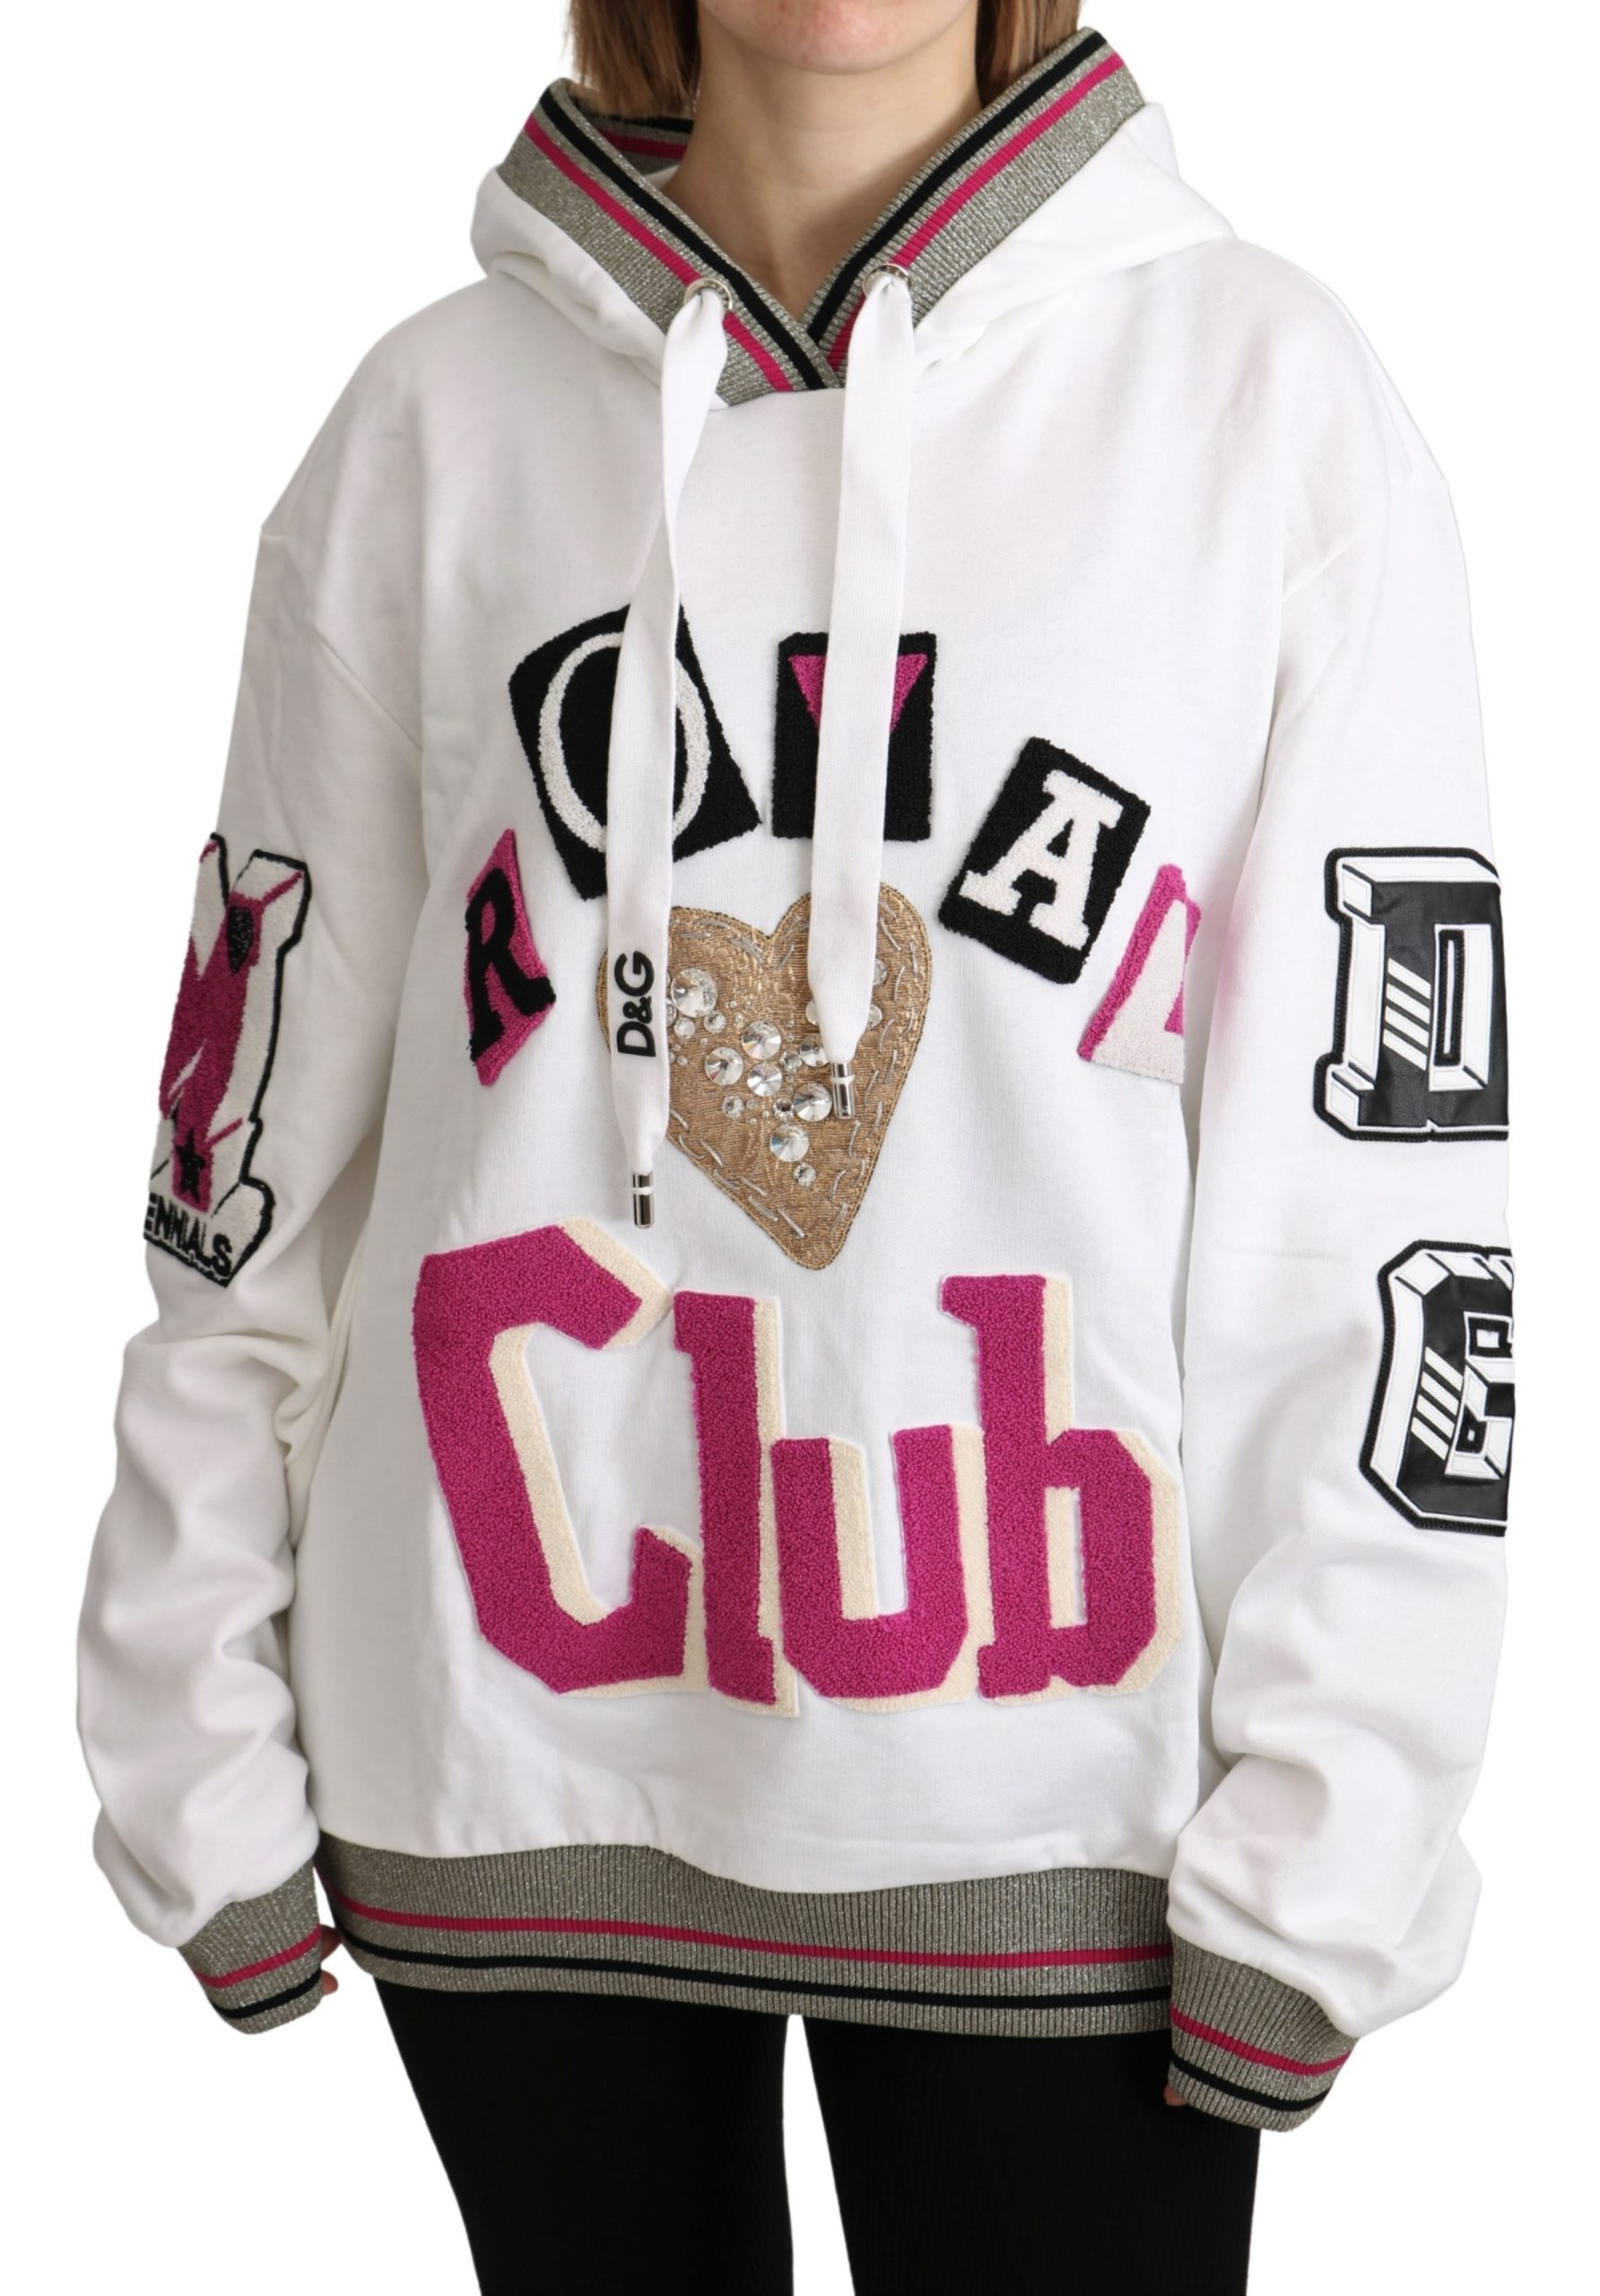 Dolce & Gabbana Women's Royal Club Hooded Crystal Sweater White TSH5181 - IT44|L